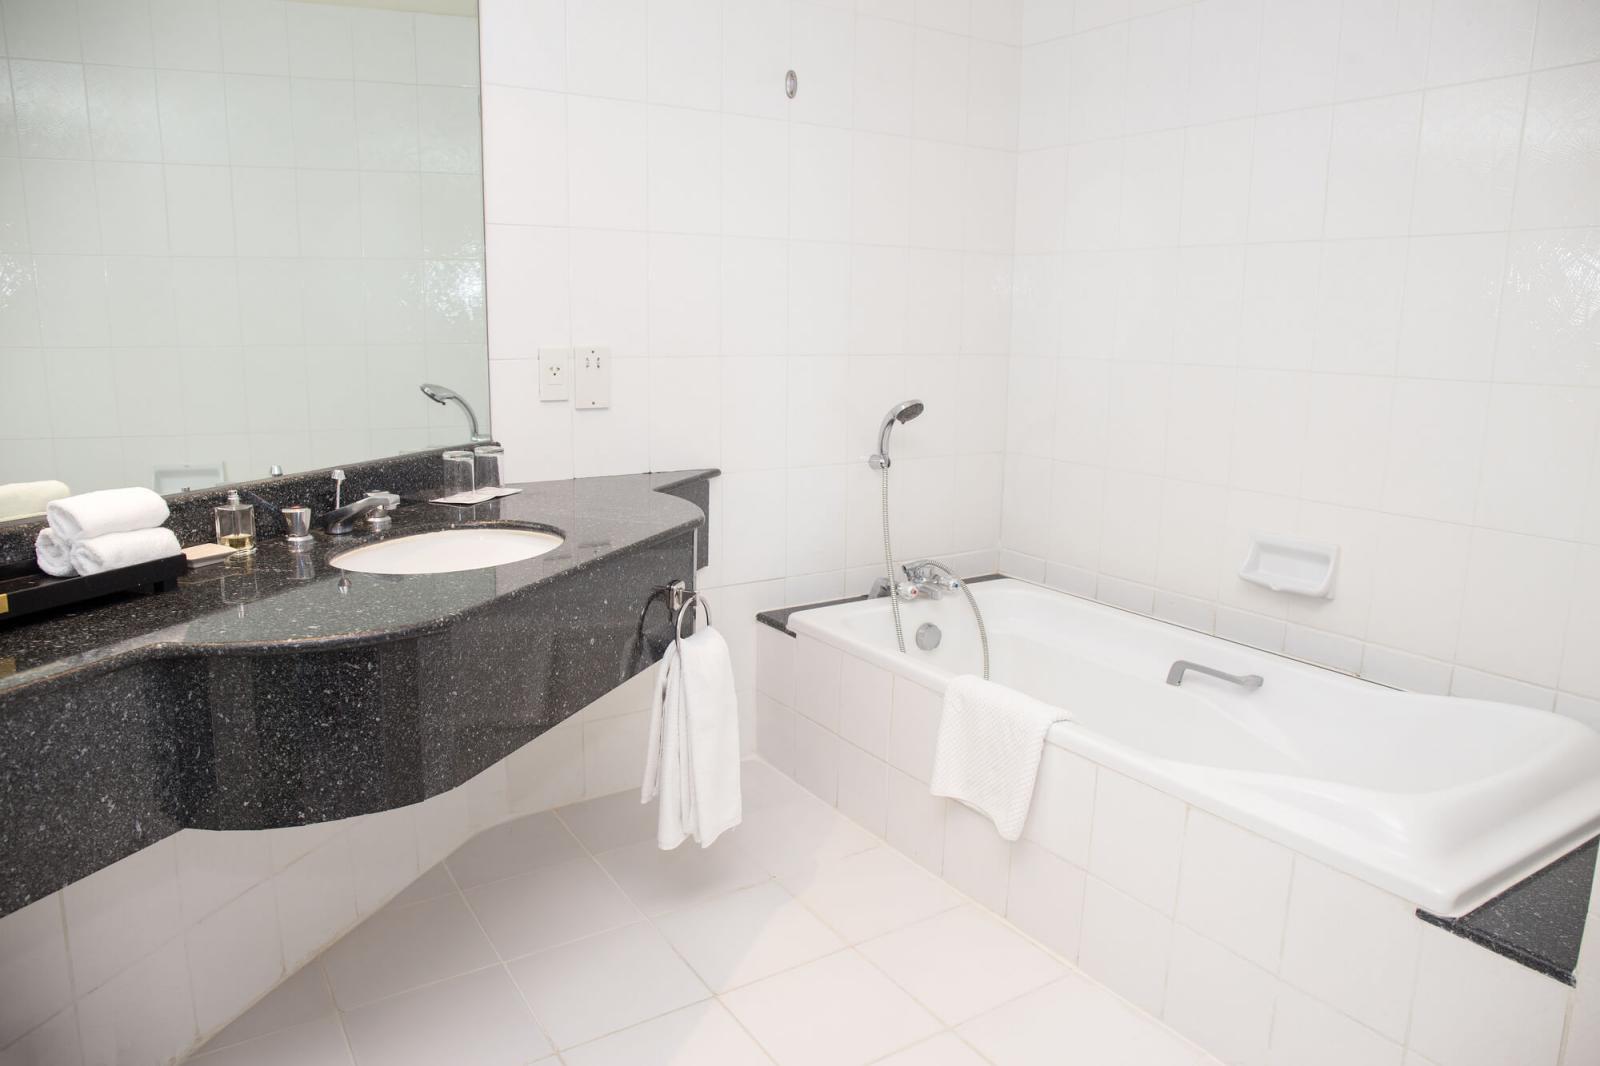 Bathtub Refinishing Tile Refinishing Like New